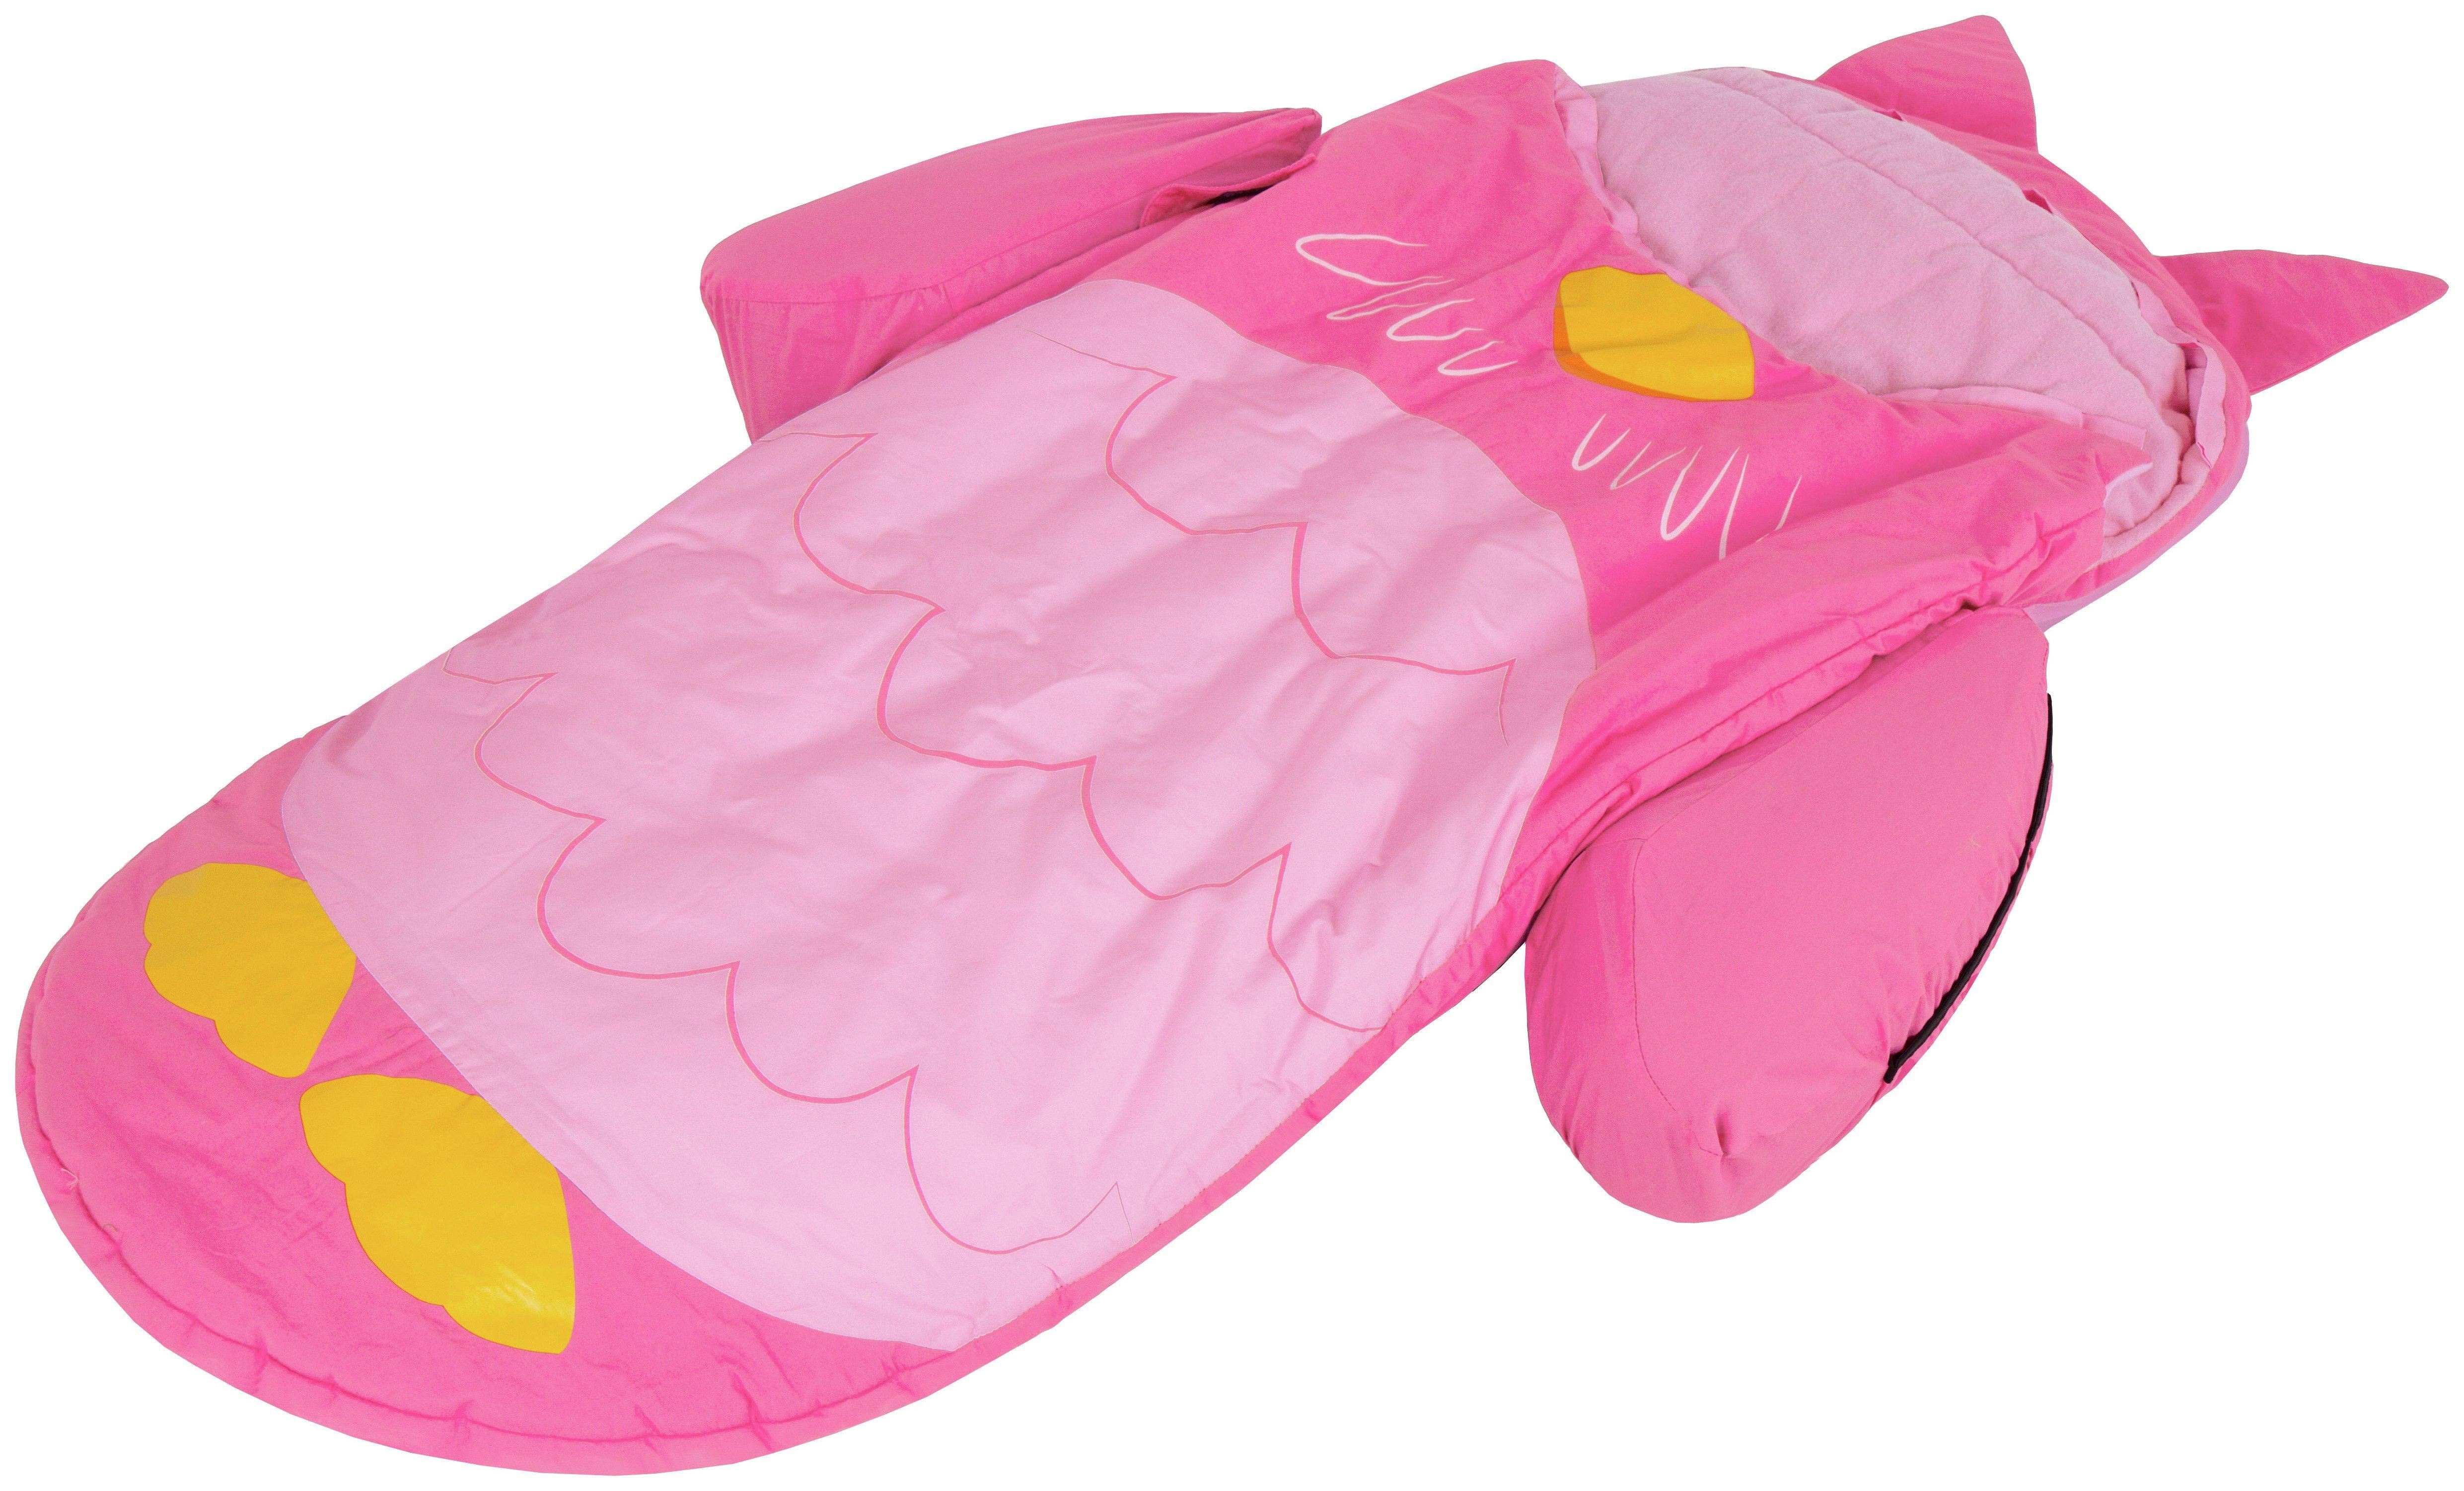 LittleLife Animal Snuggle Pod - Owl